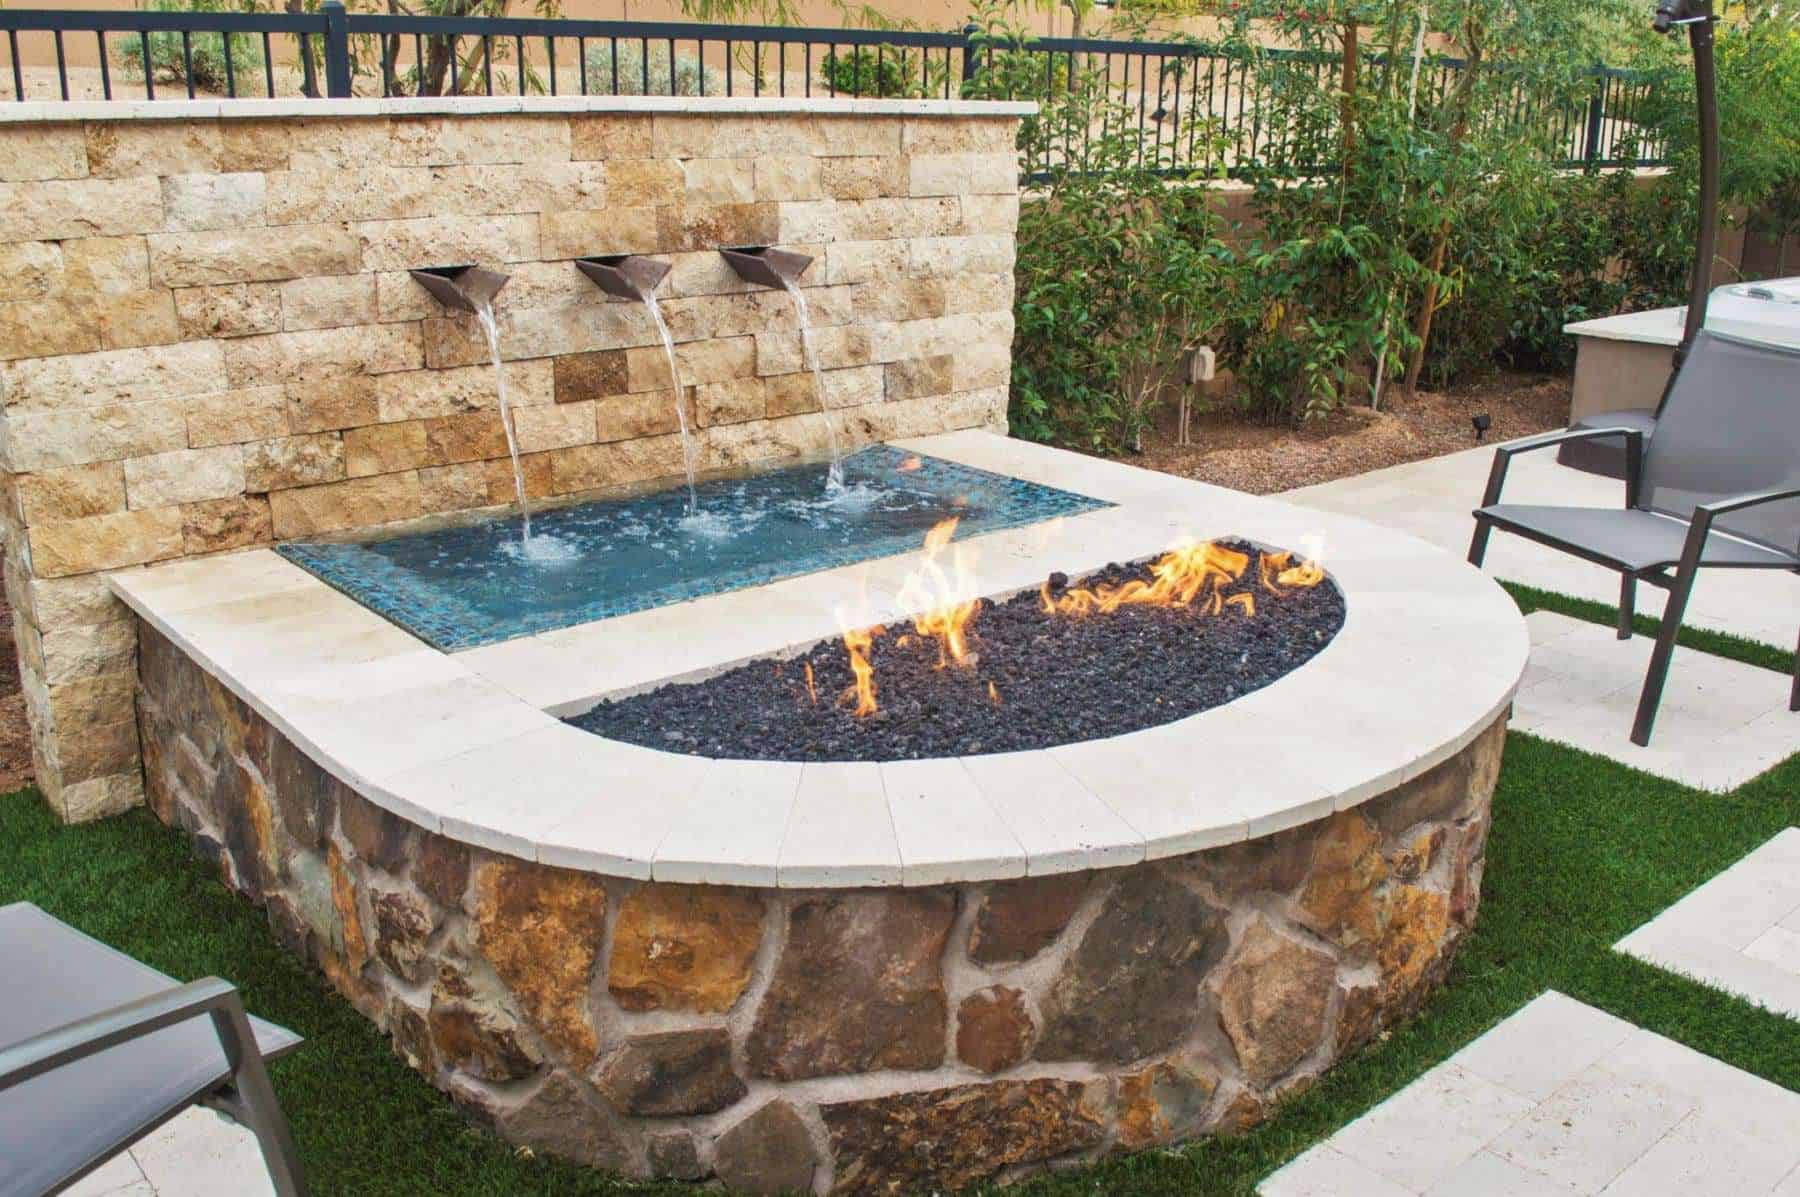 Imagine Backyard Living installation